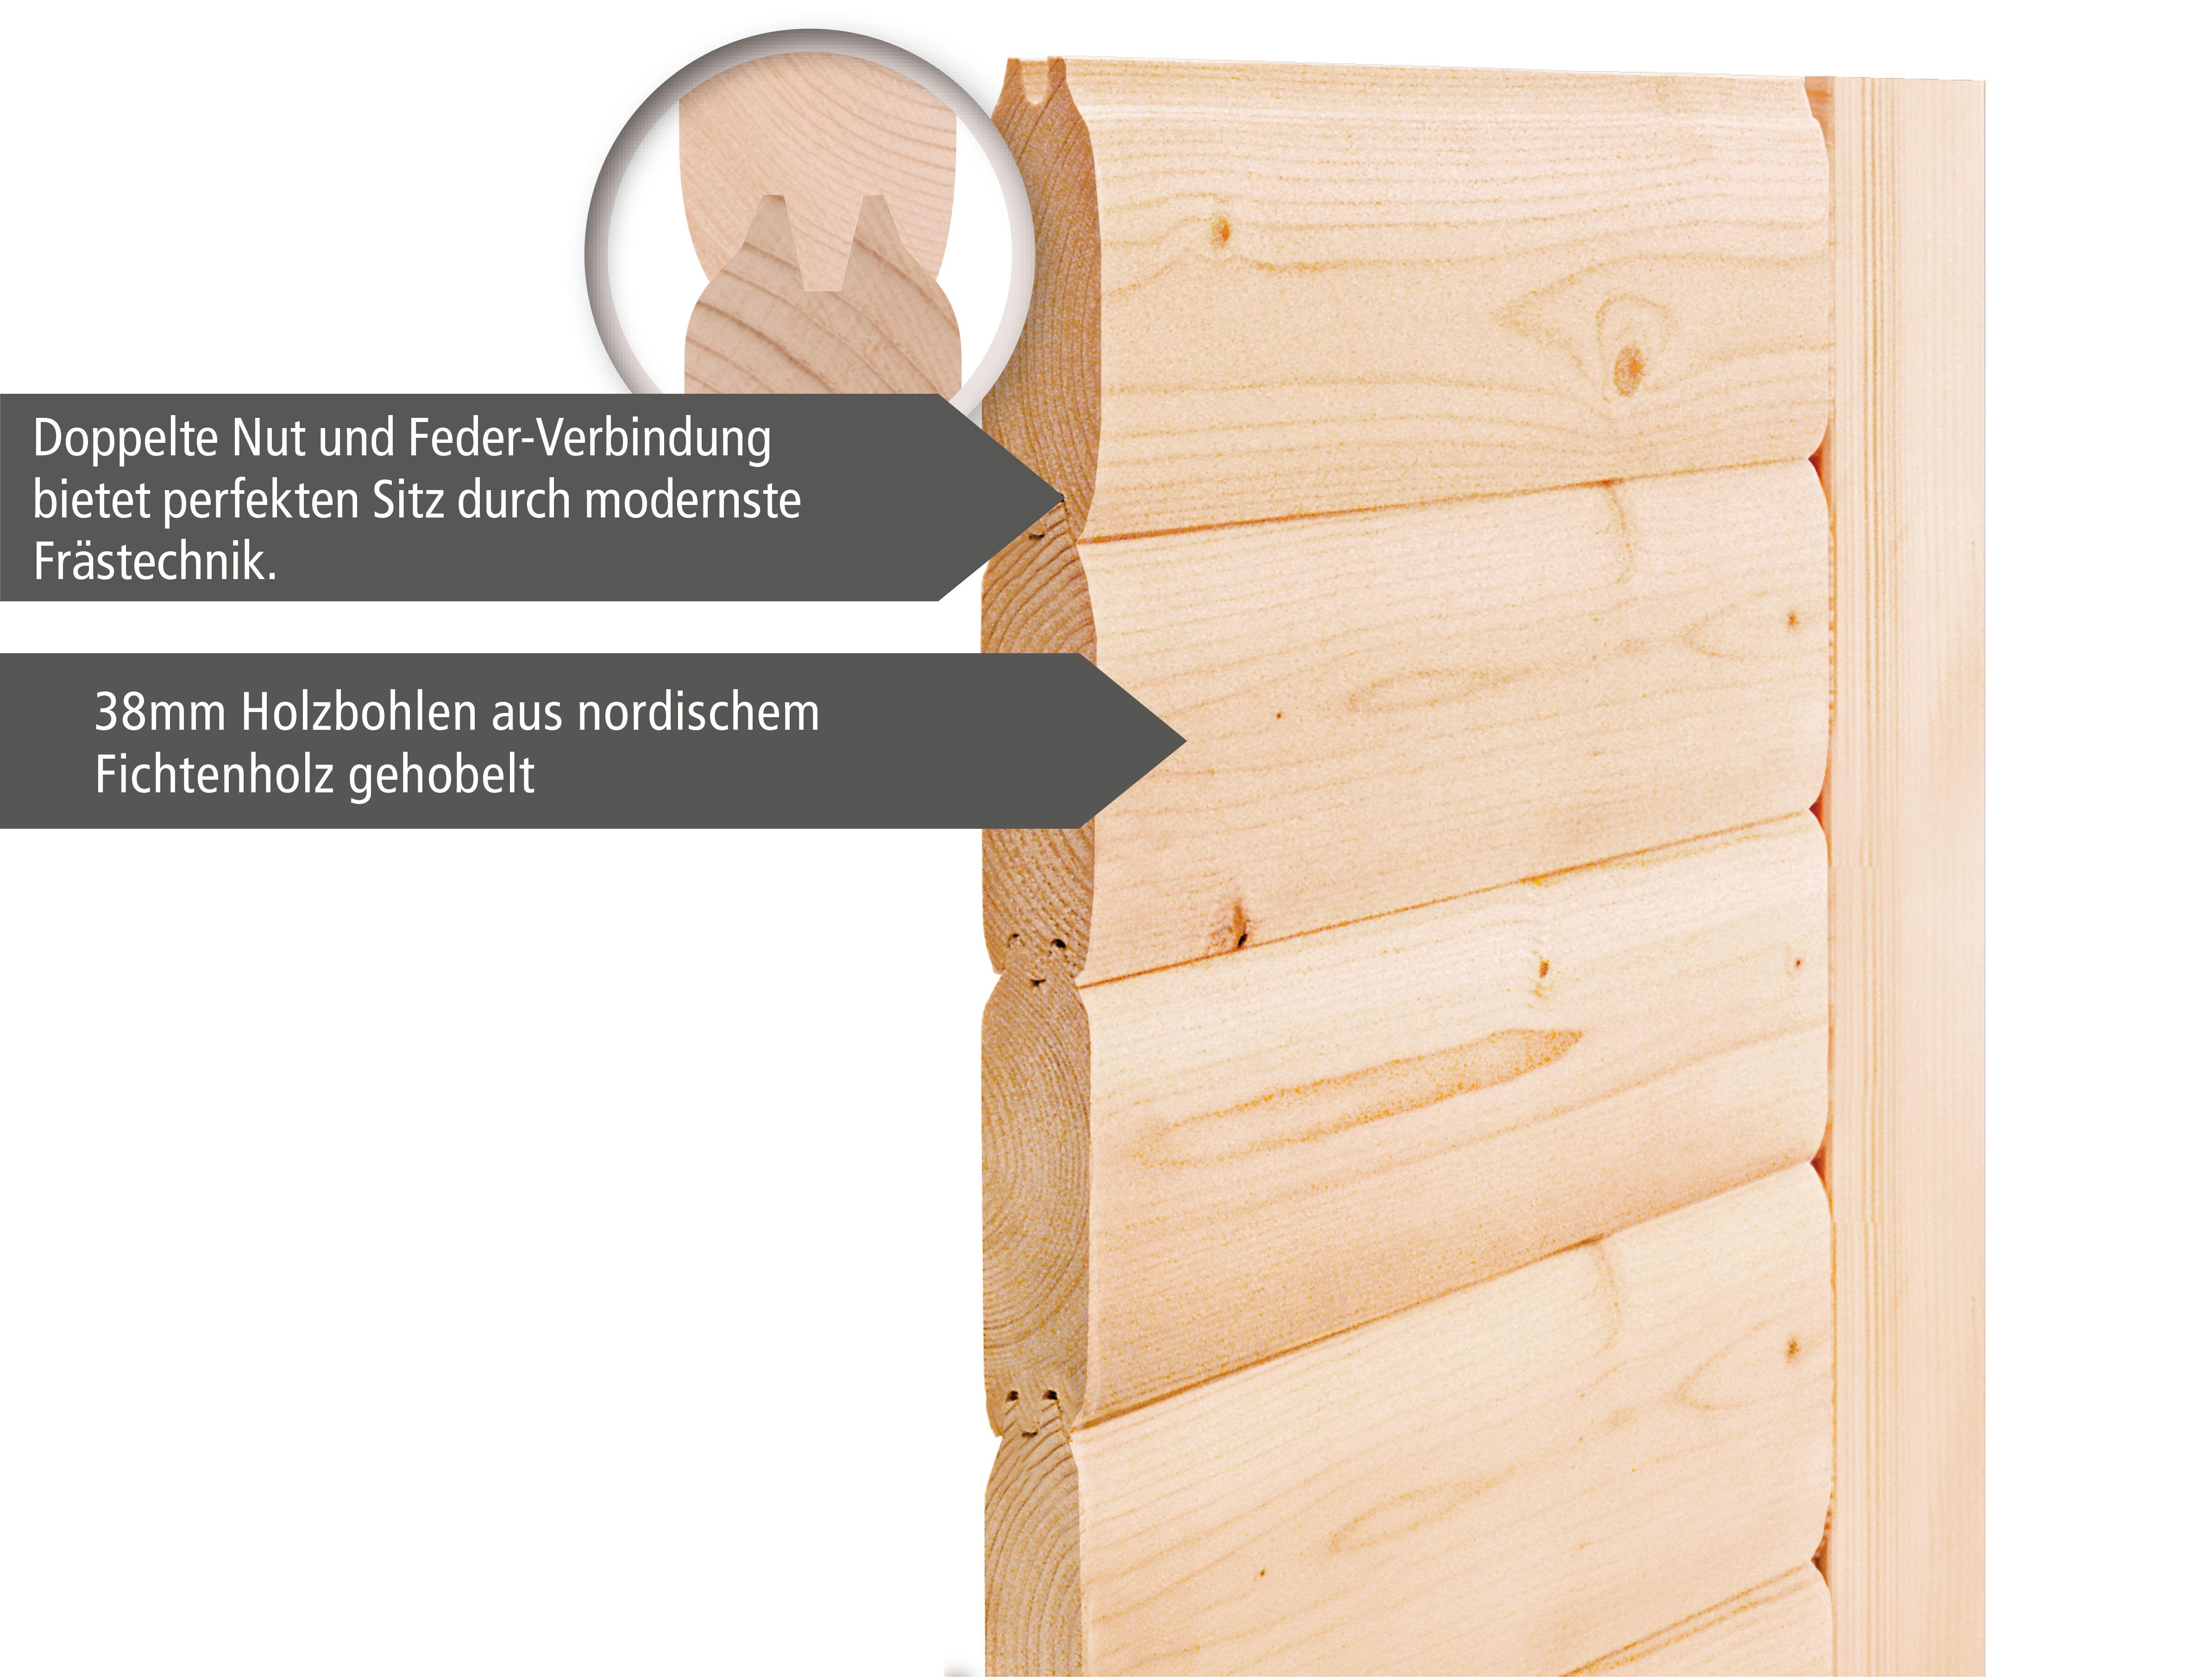 Woodfeeling Sauna Selena 38mm Bio Saunaofen 9 kW extern Bild 4